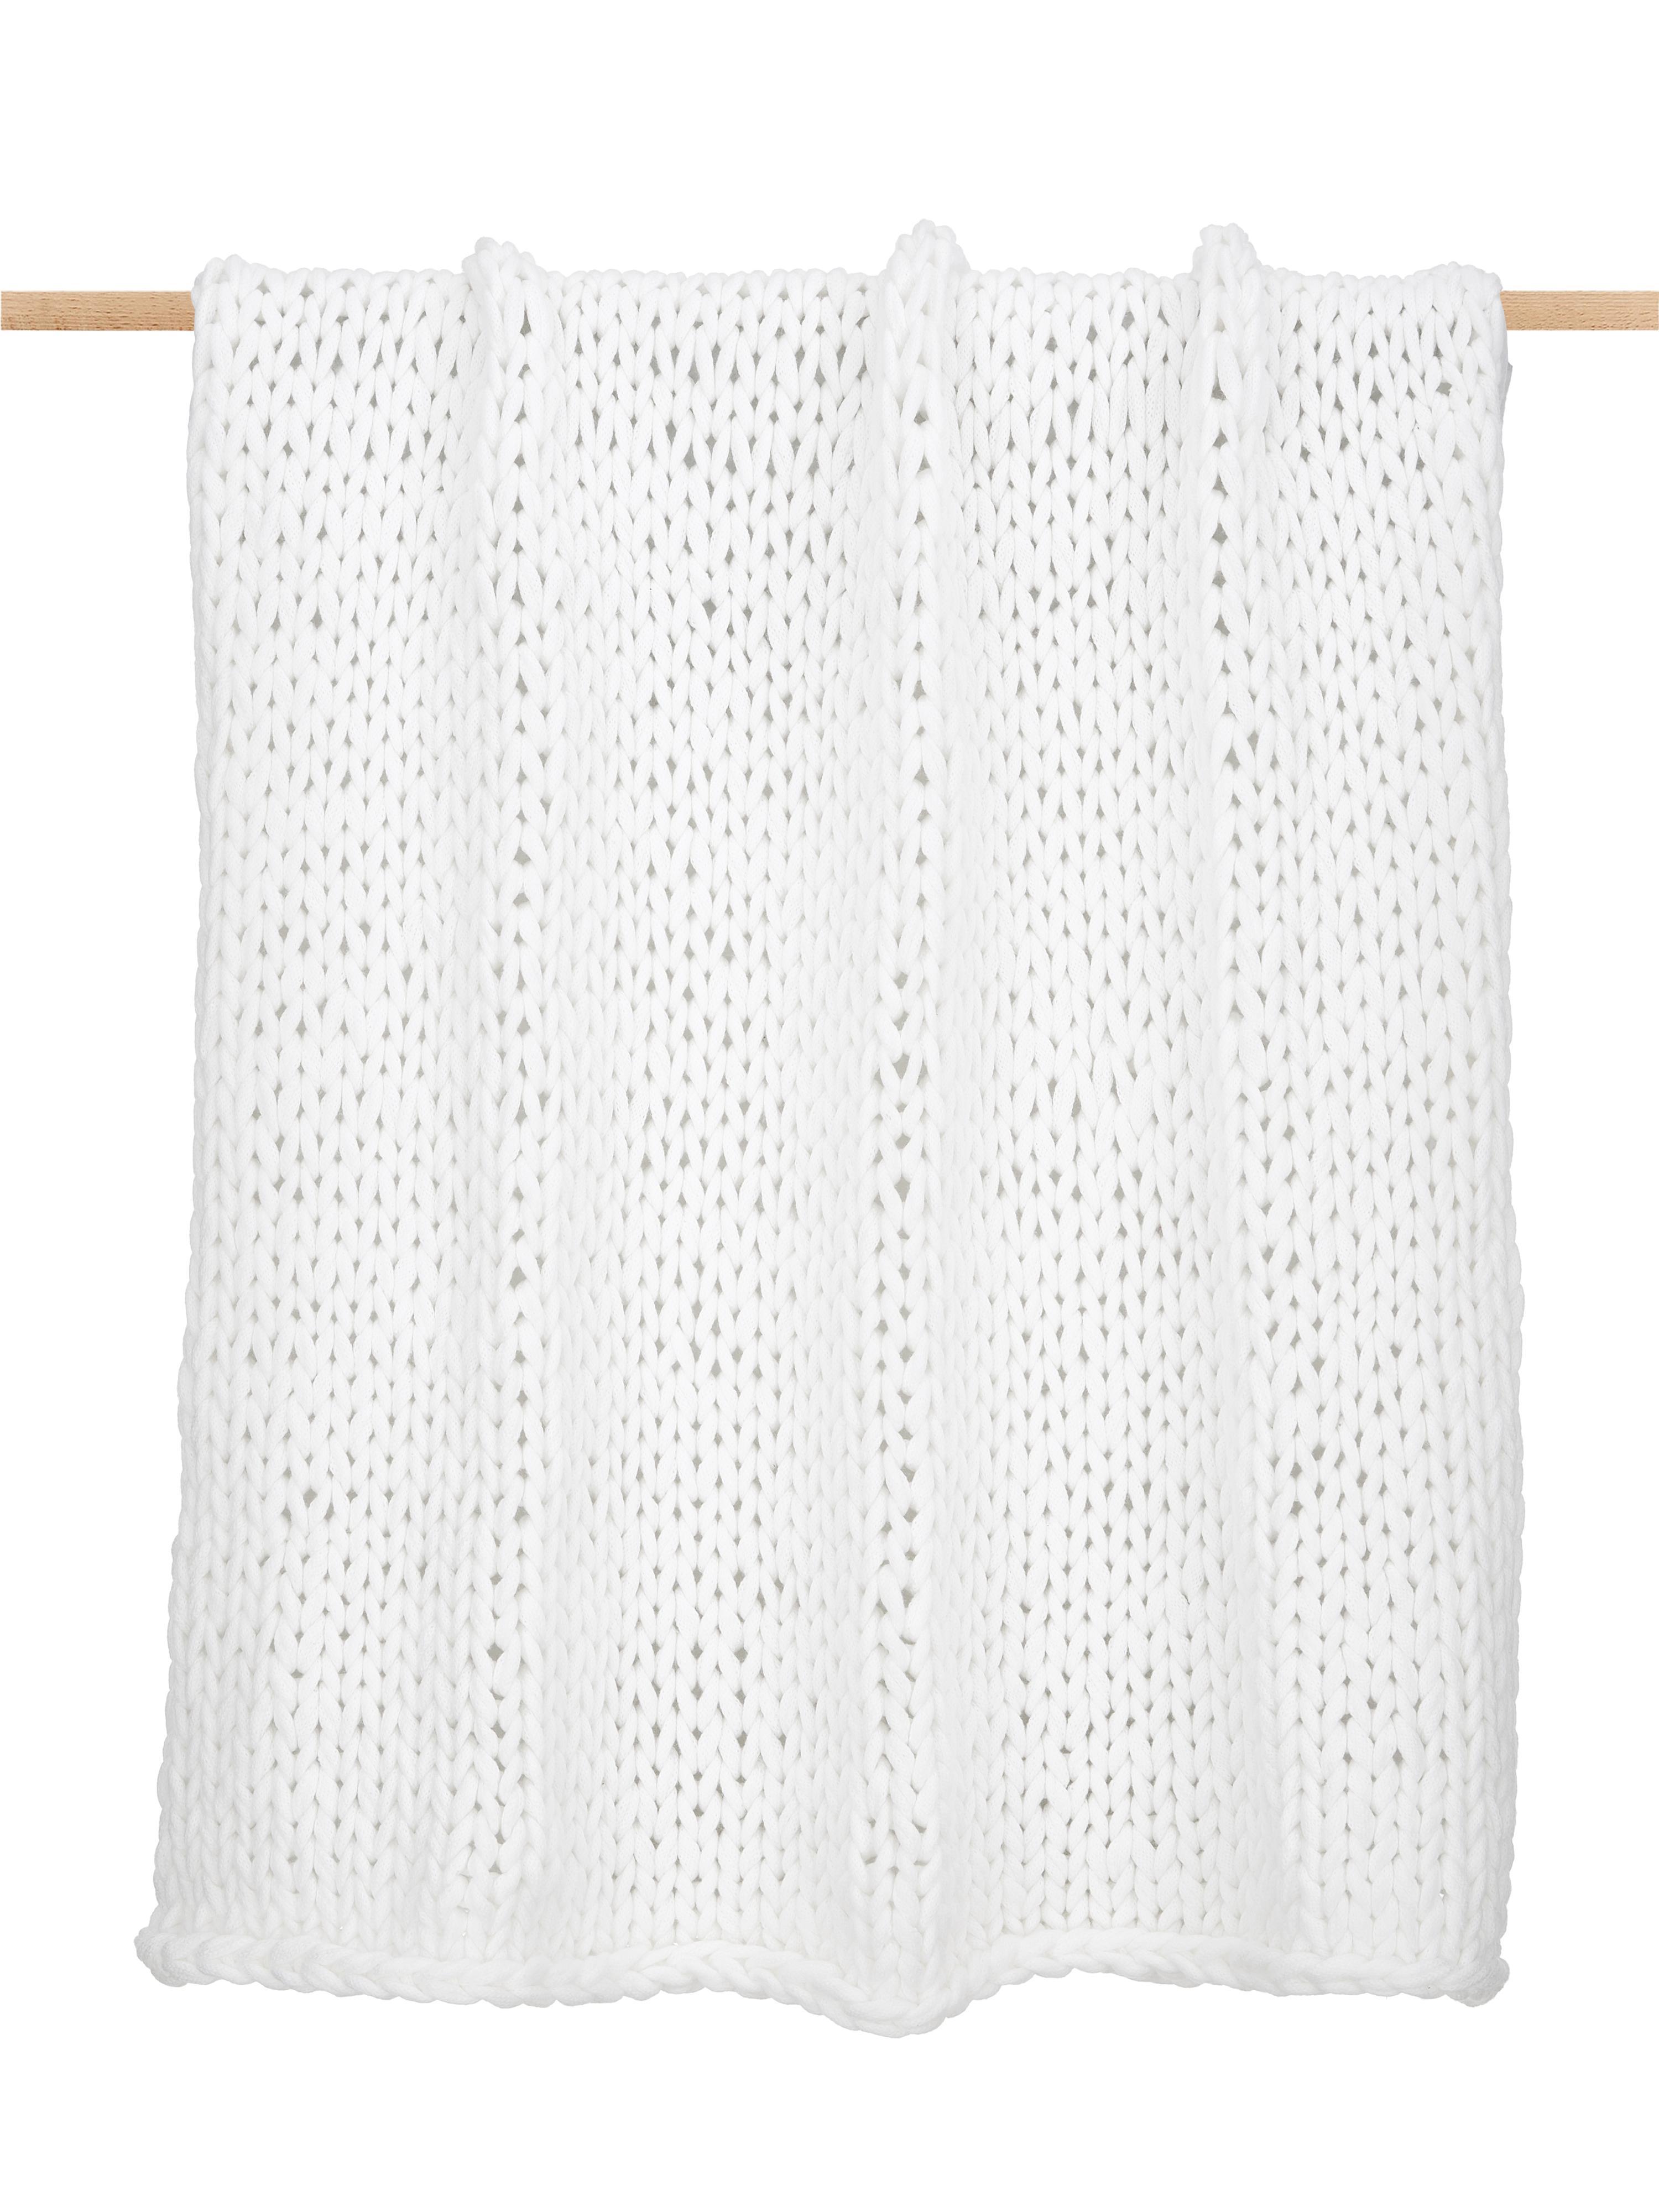 Plaid a maglia grossa bianco Adyna, 100% poliacrilico, Bianco crema, Larg. 130 x Lung. 170 cm